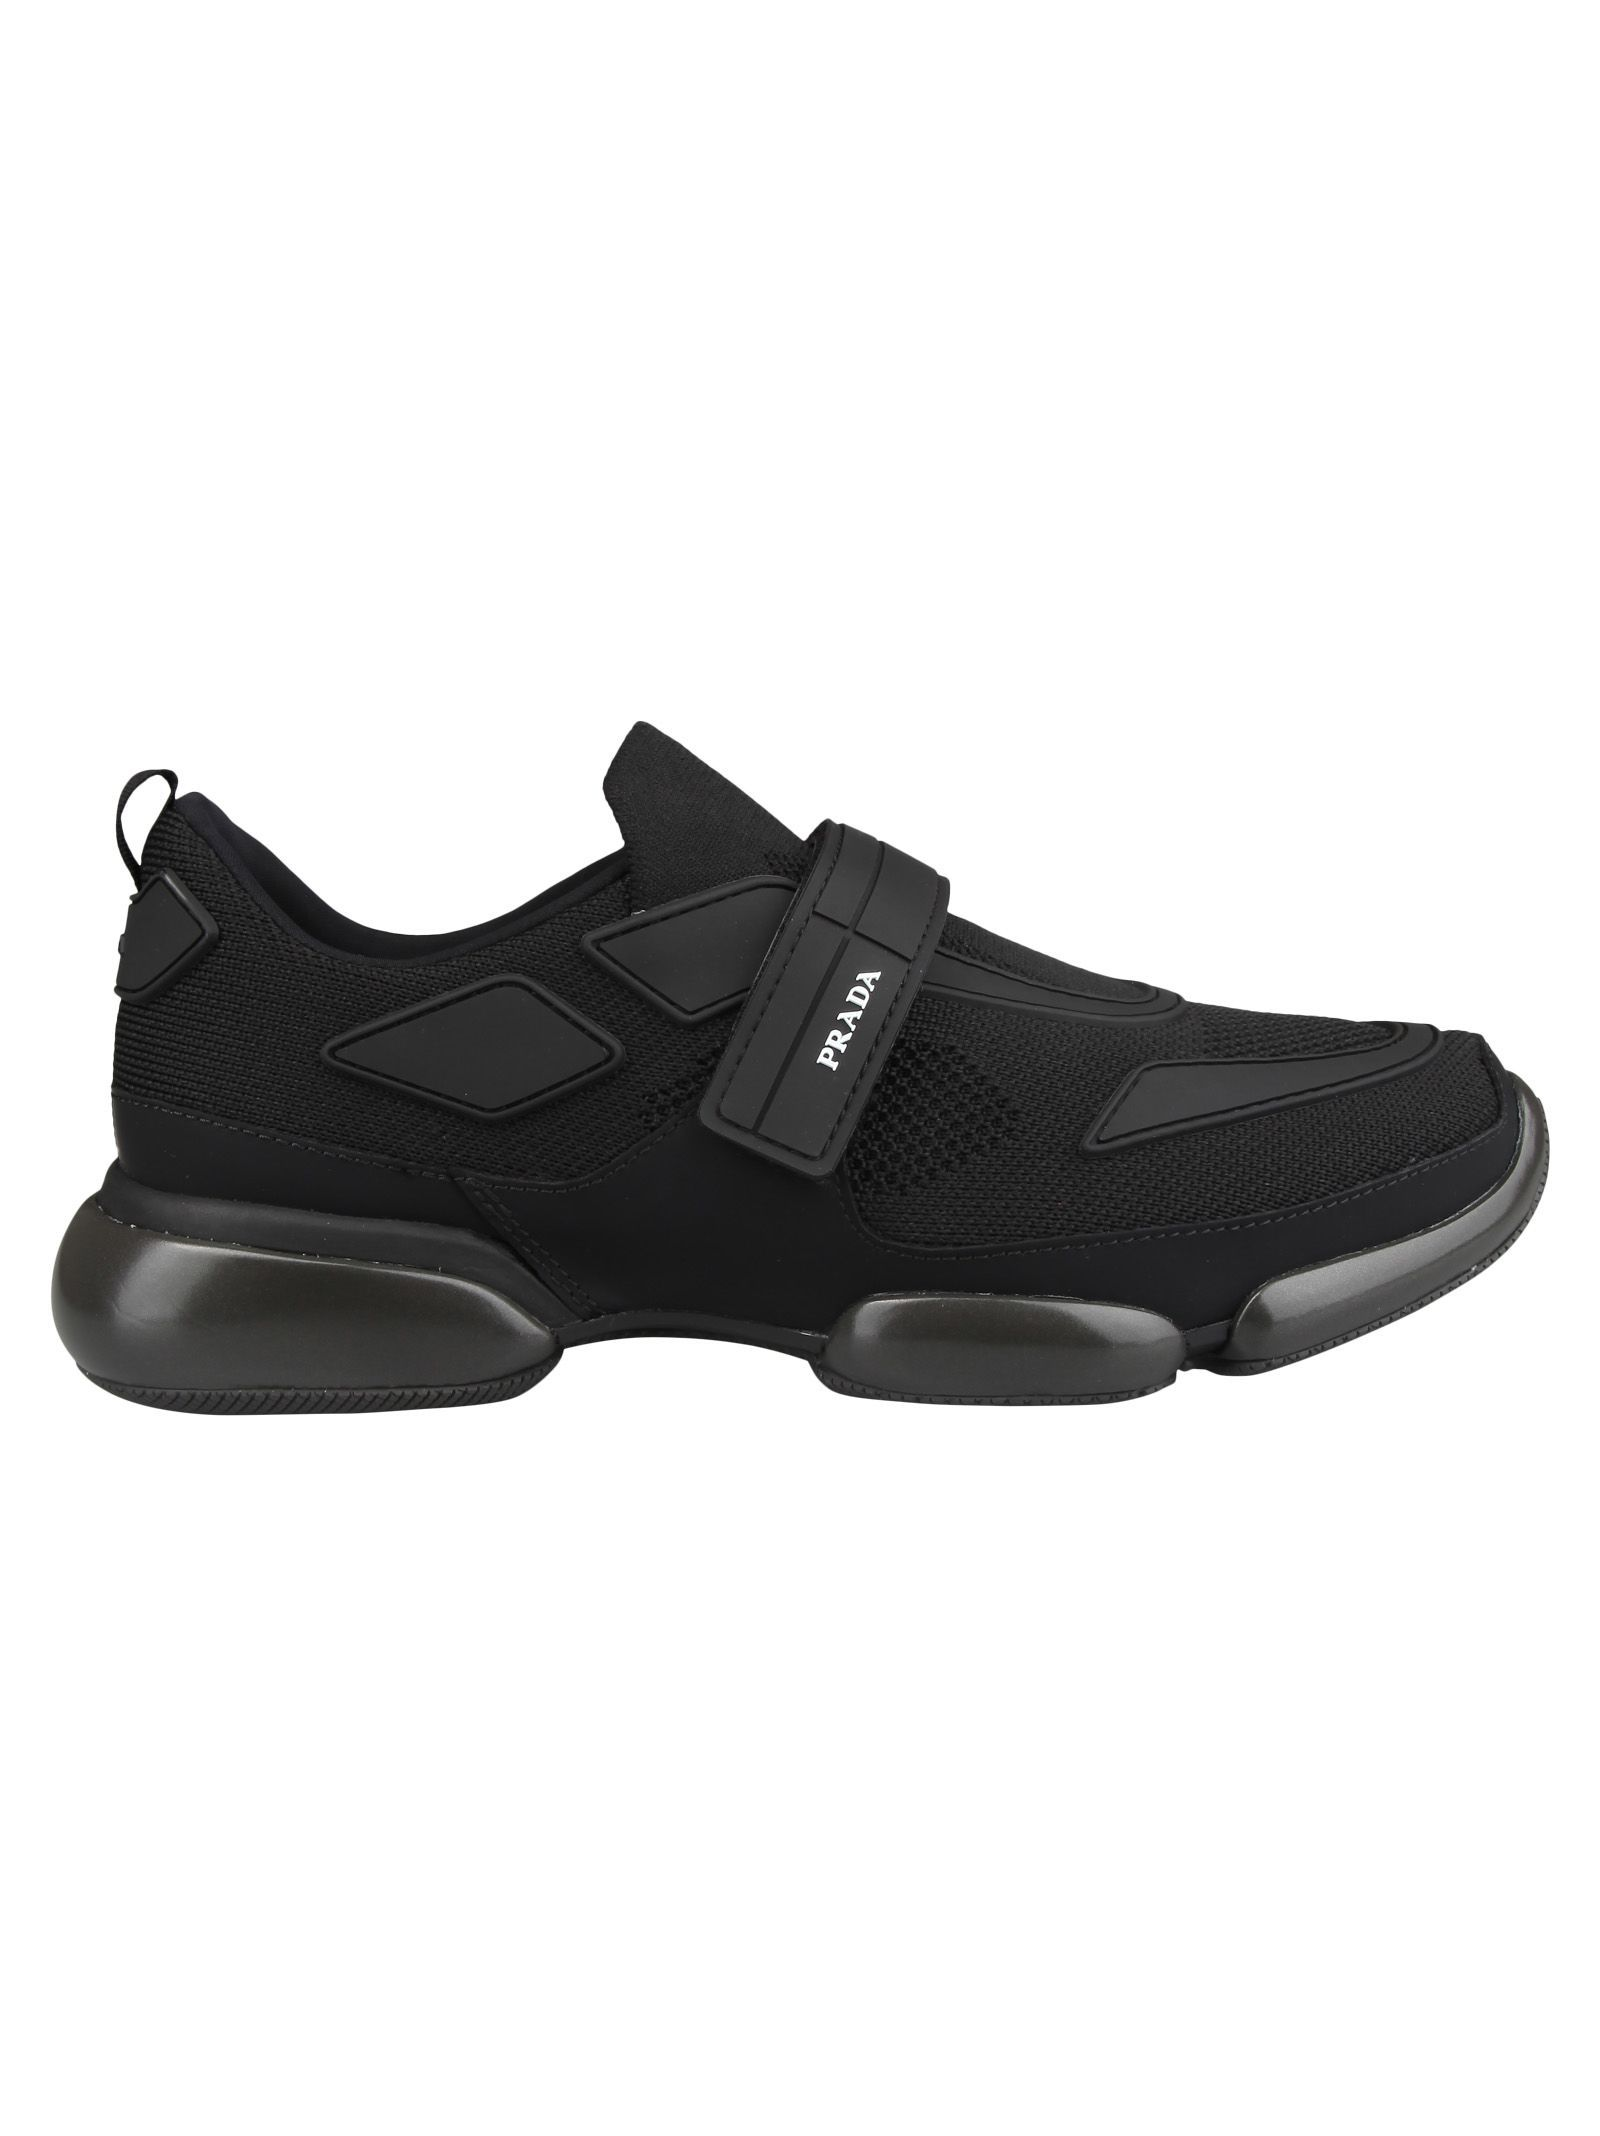 e4f642d92cef8 PRADA CLOUDBUST SNEAKERS.  prada  shoes